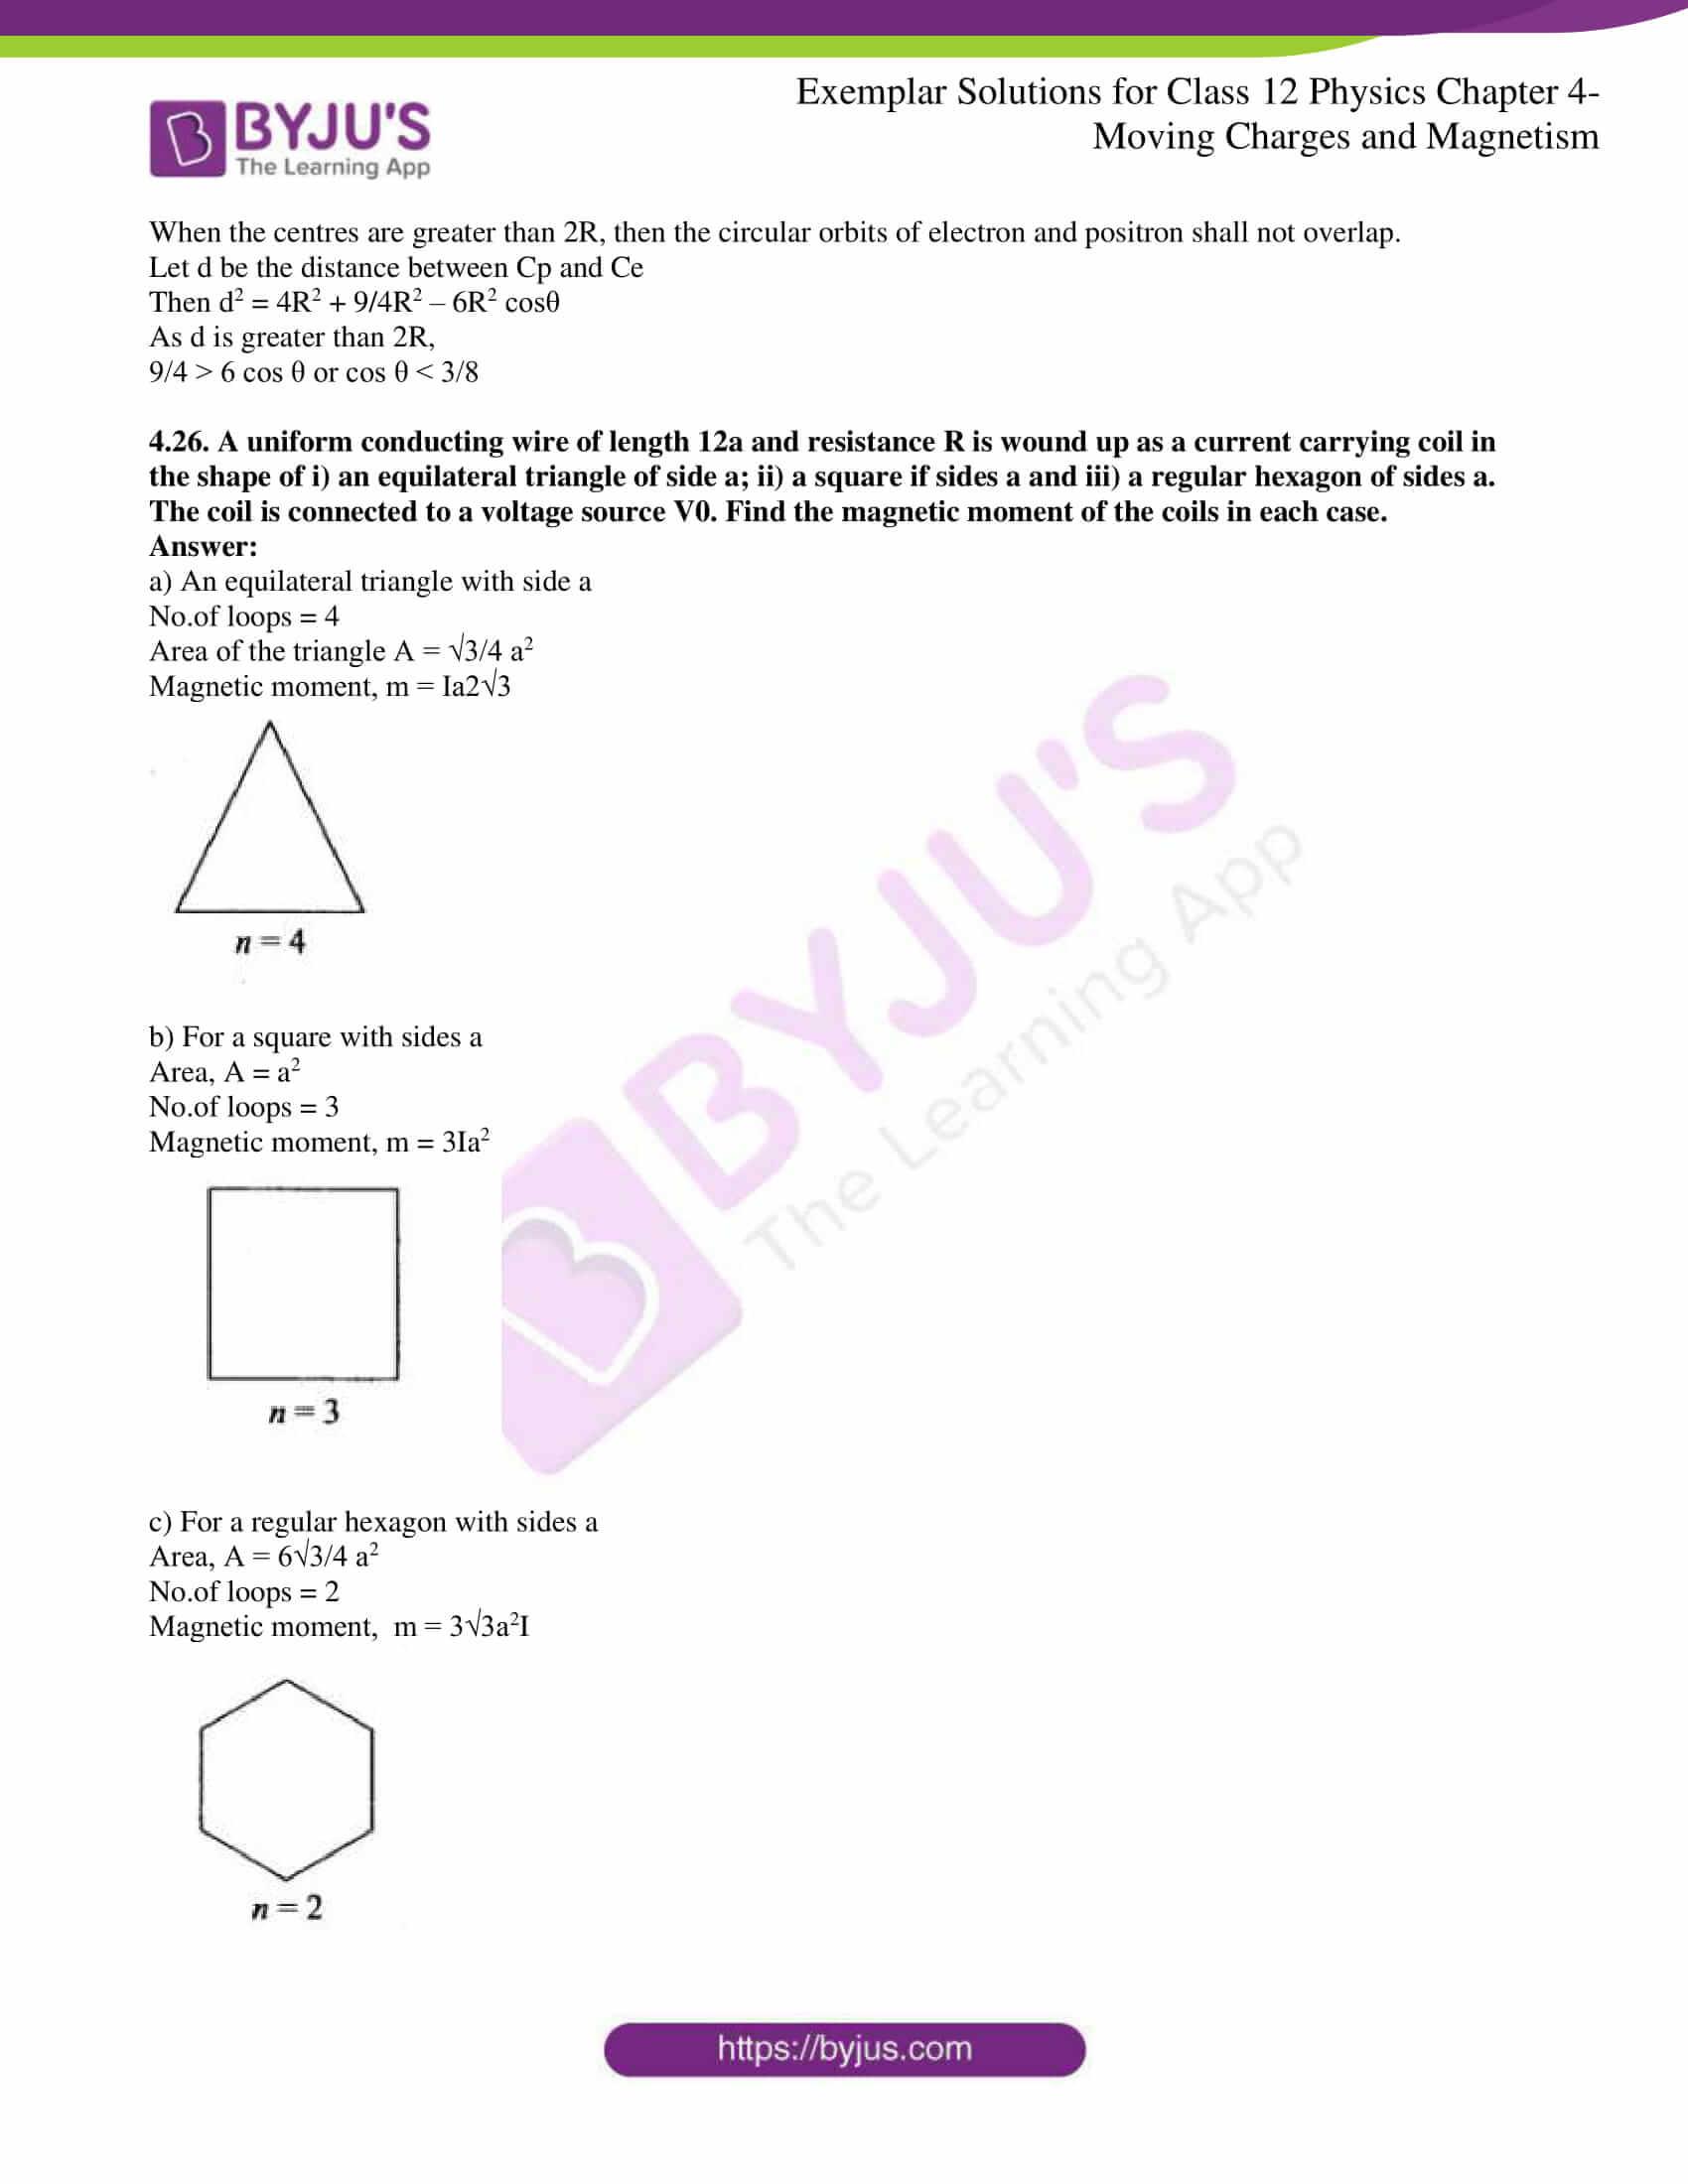 ncert exemplar solutions for class 12 physics chapter 4 09